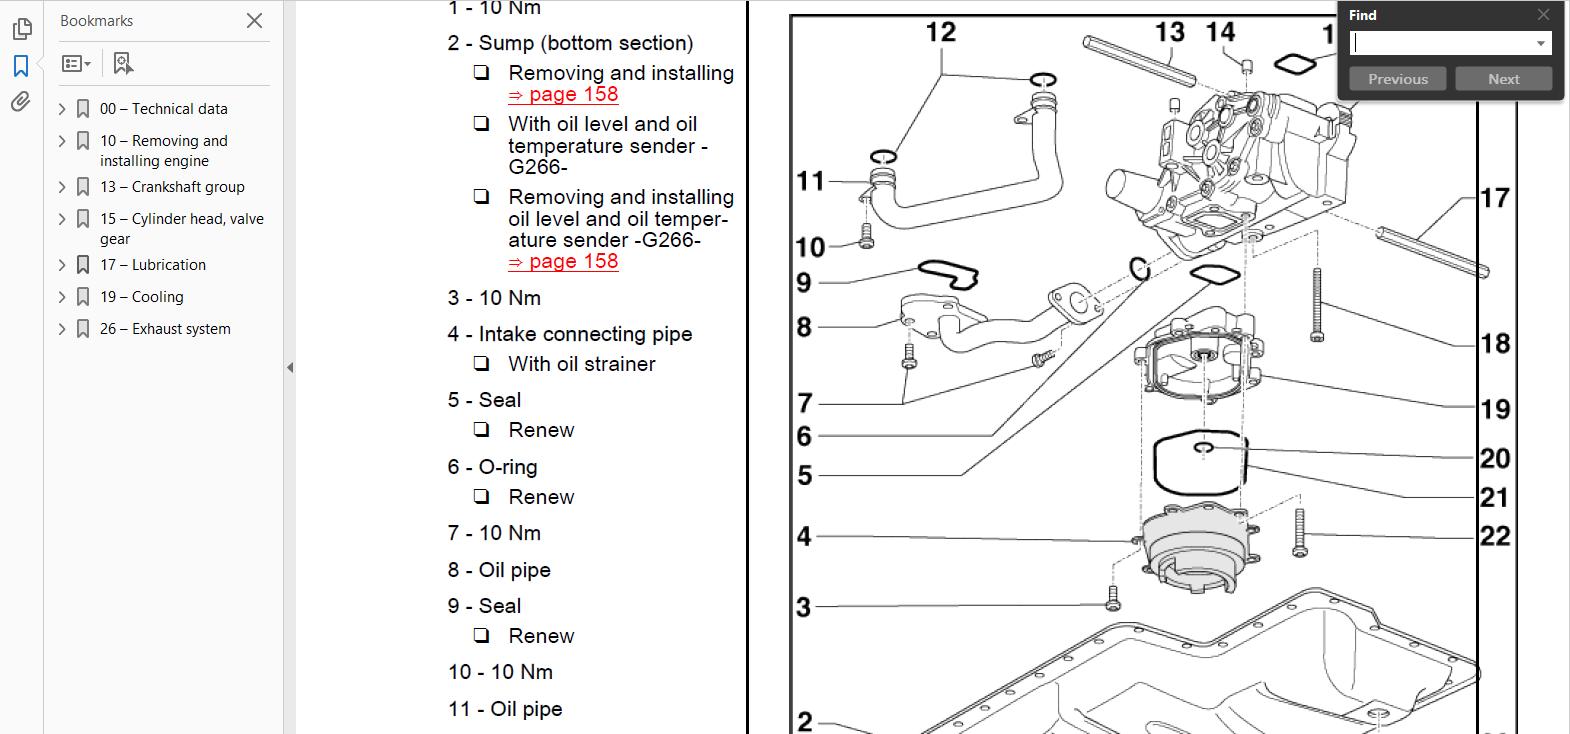 Official Workshop Manual Service Repair Audi A6 C5 Allroad 2000 - 2005 |  eBay